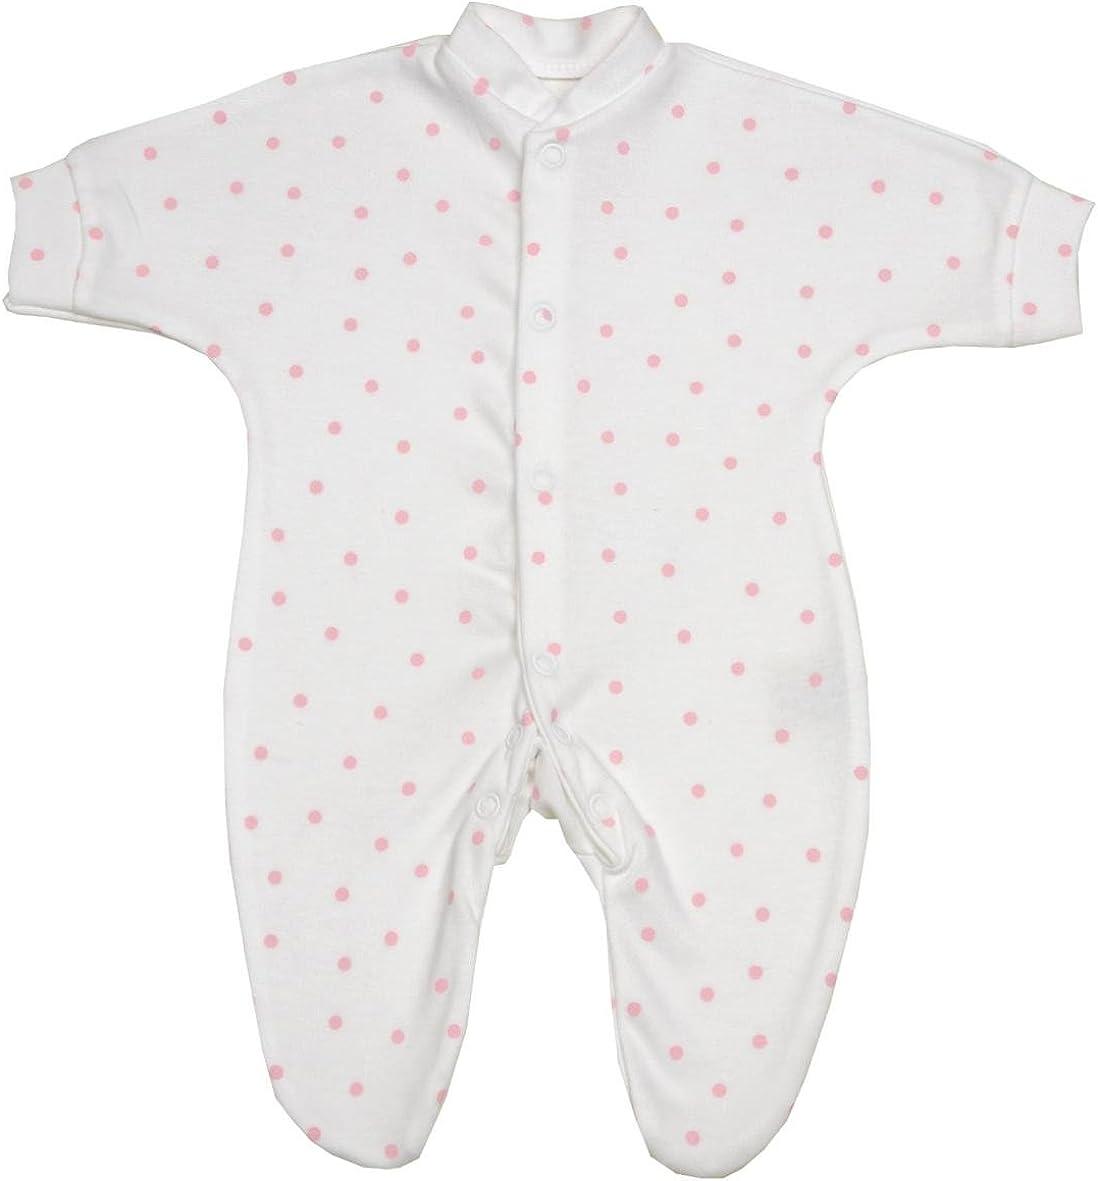 BabyPrem Preemie Baby Printed Girls Sleeper Clothes 0-7.5lb